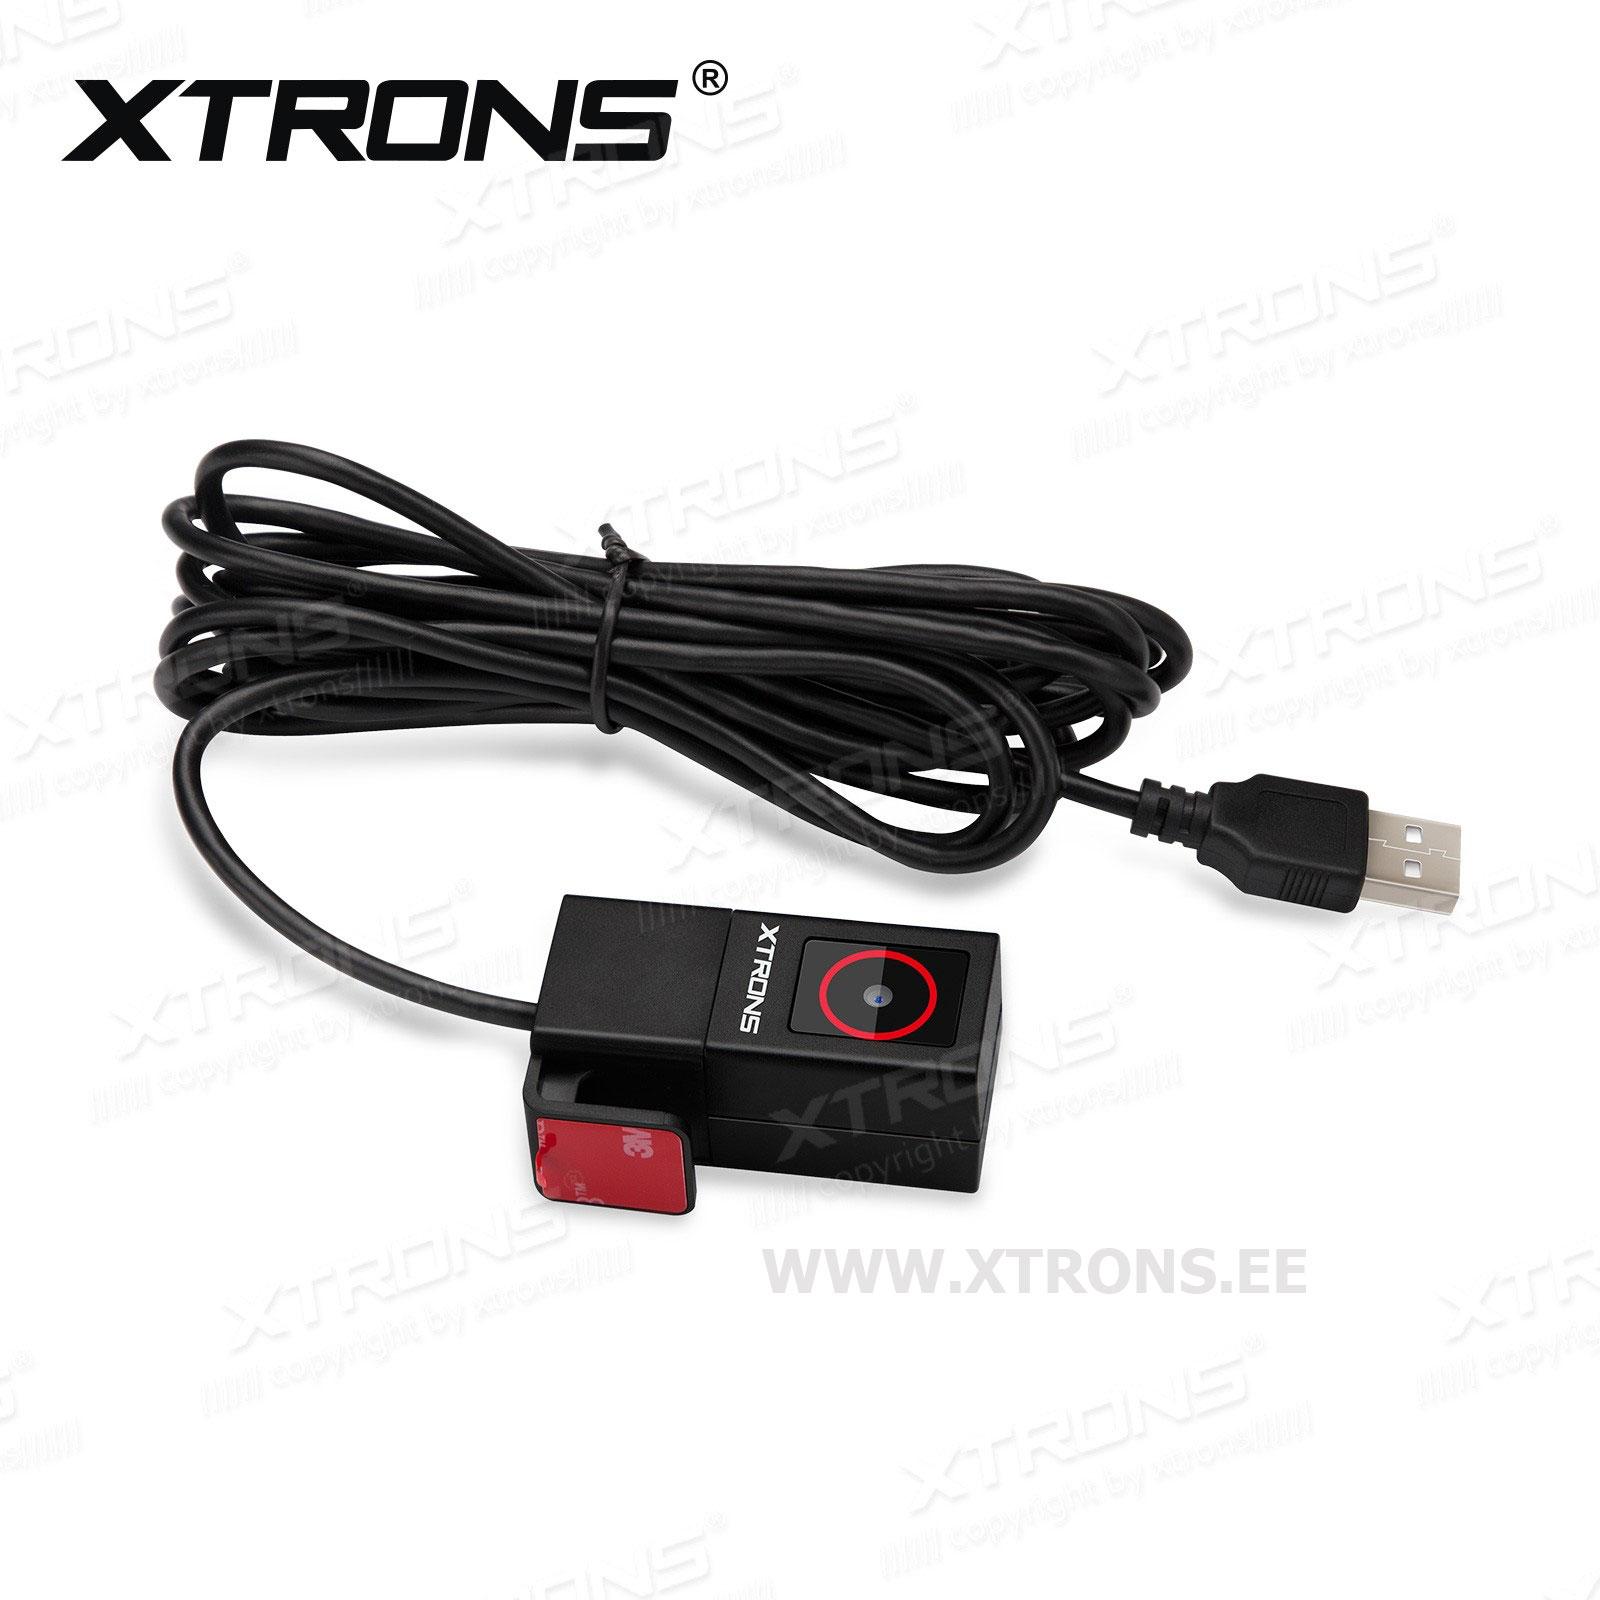 XTRONS DVR019